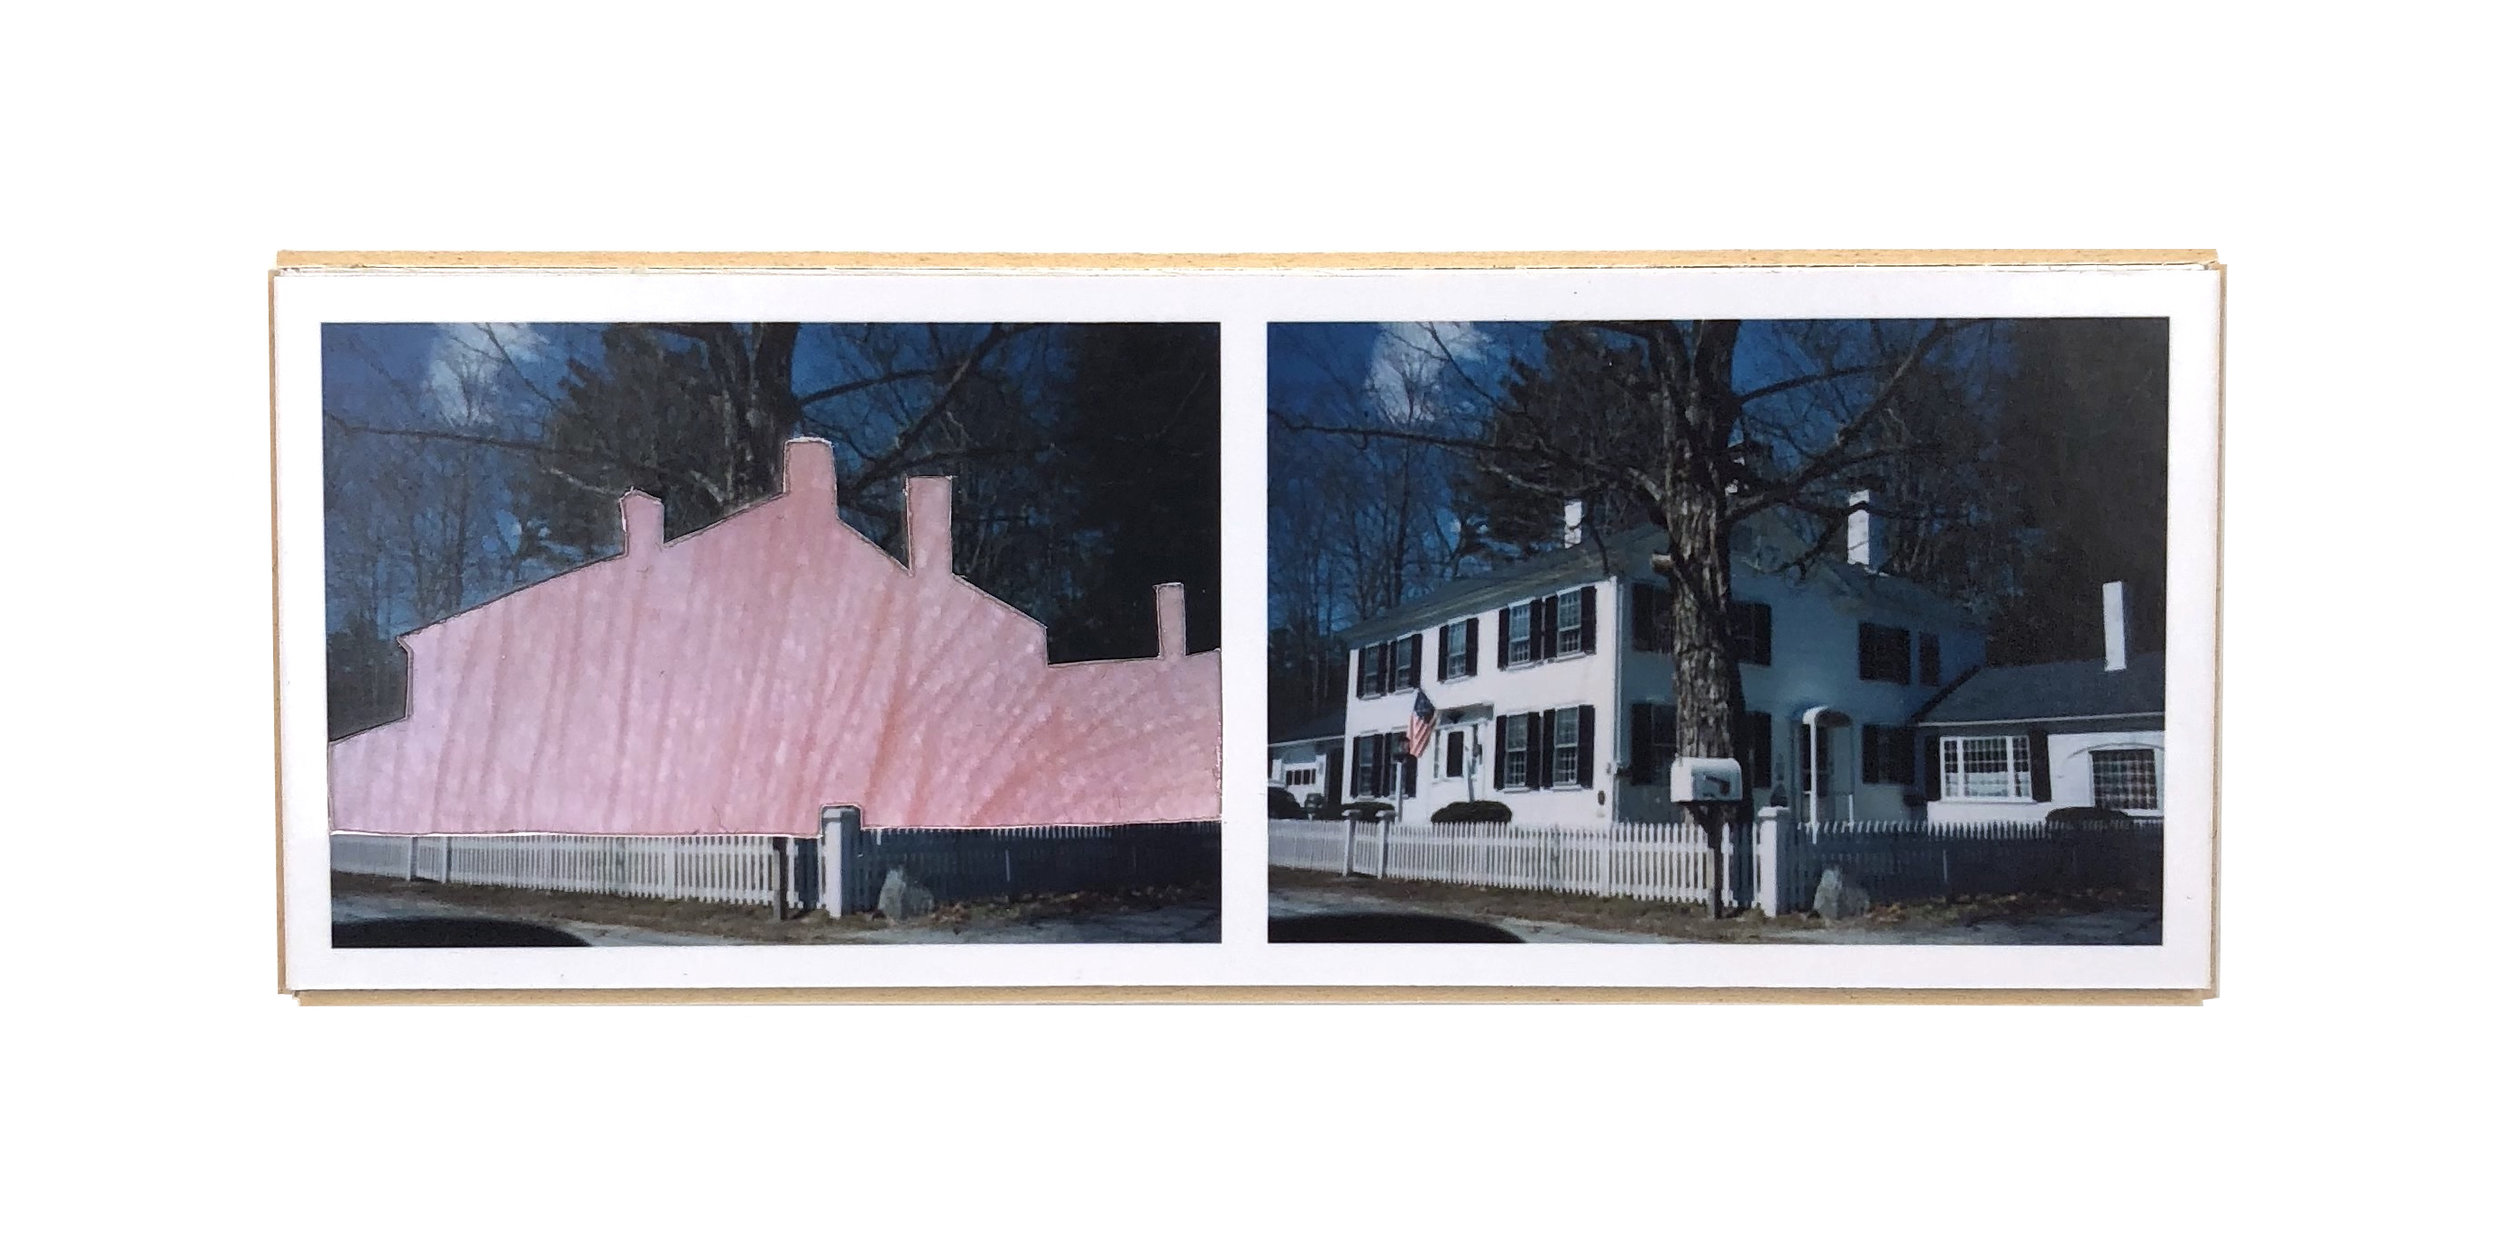 Split, Warner   ,  2015  hand-cut photo-collage (mounted on matte board, foamcore)  2L x 5W x ¾ D inches